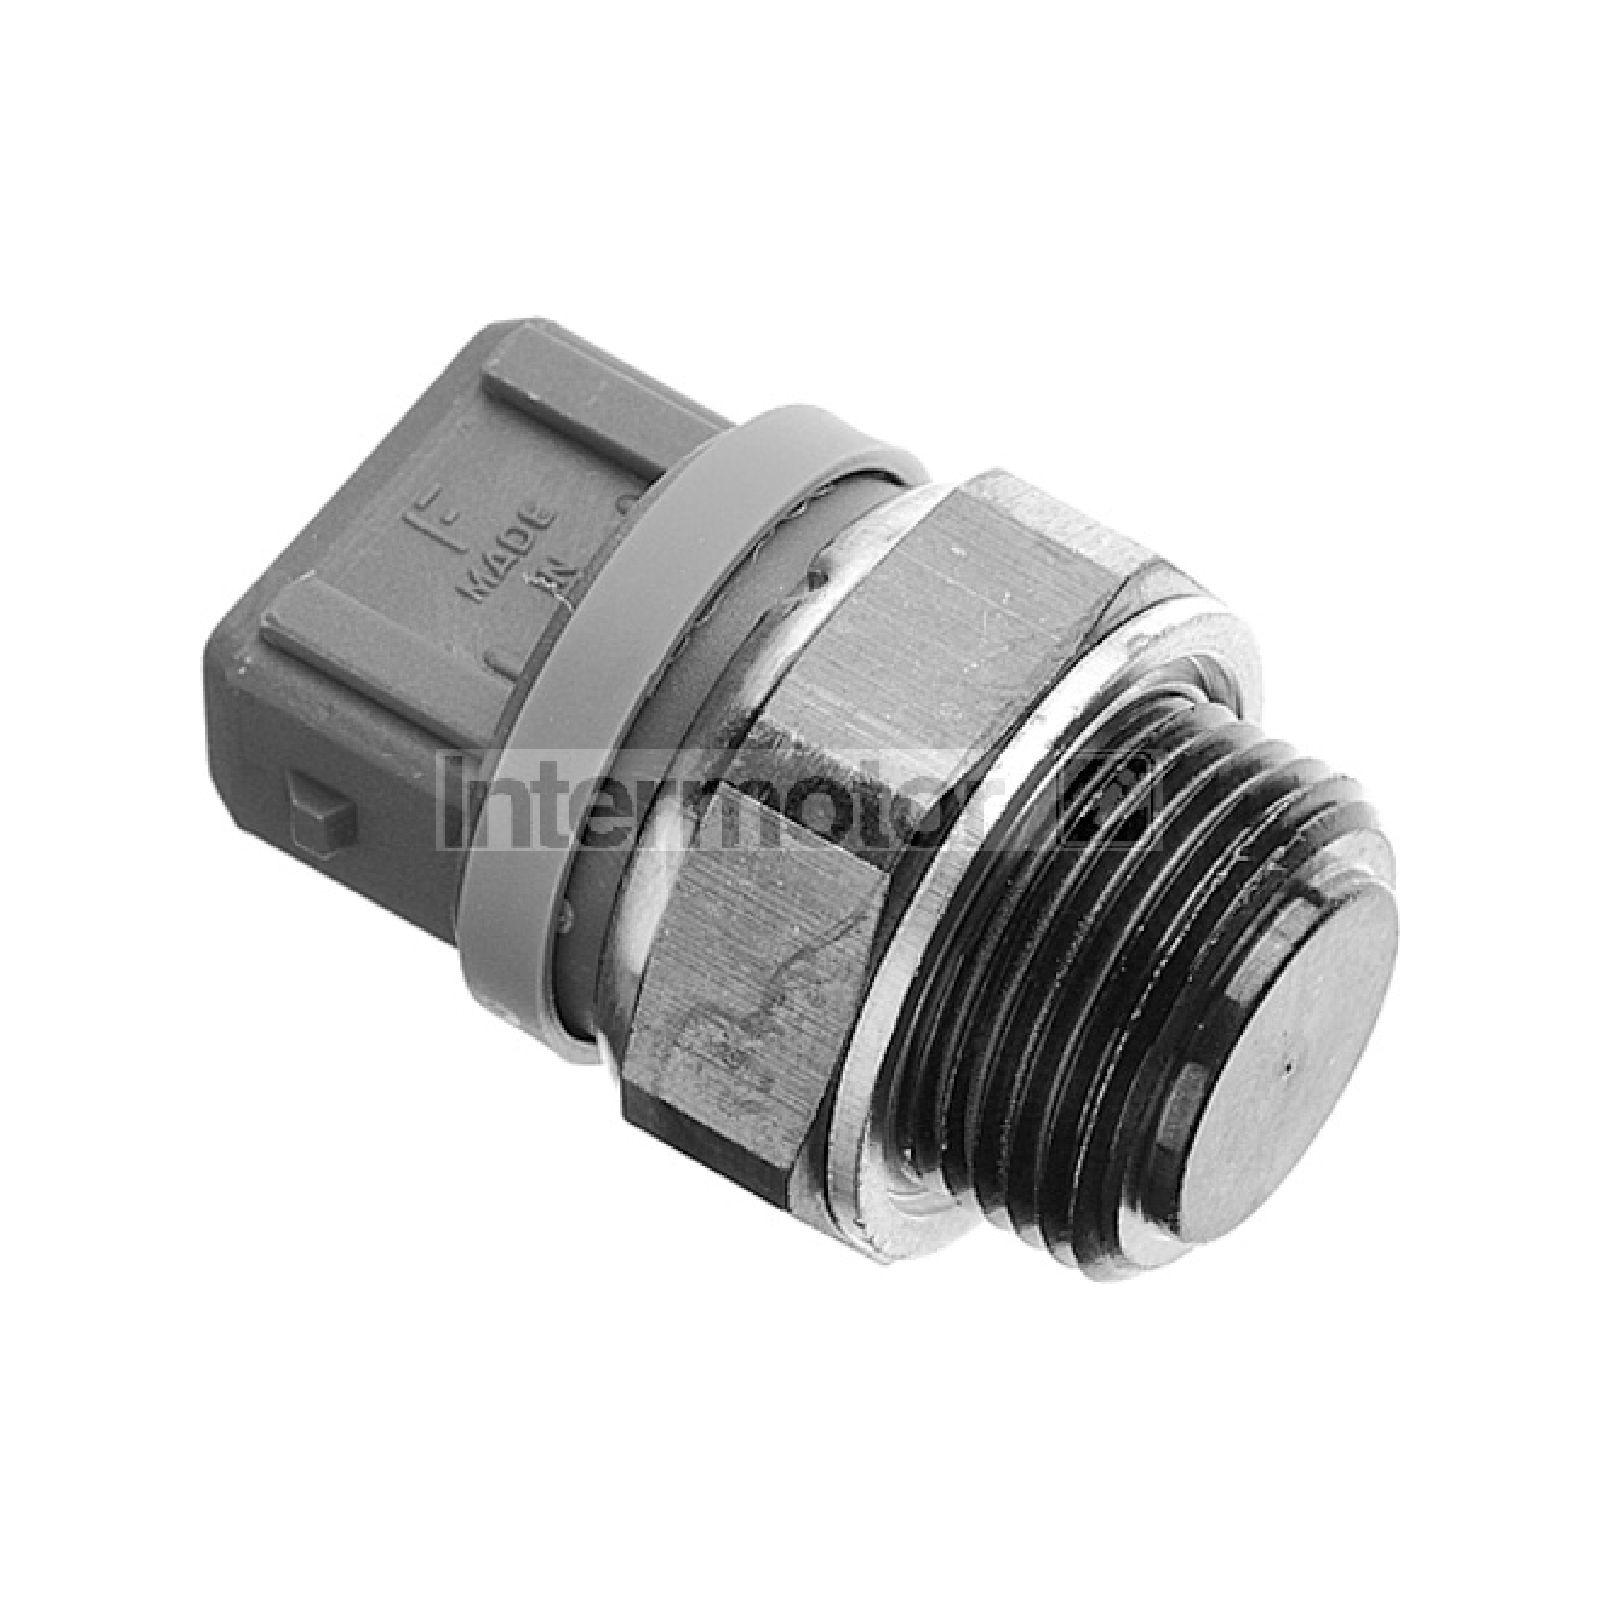 Cooling Fan Temperature Switch : °c range intermotor radiator fan temperature